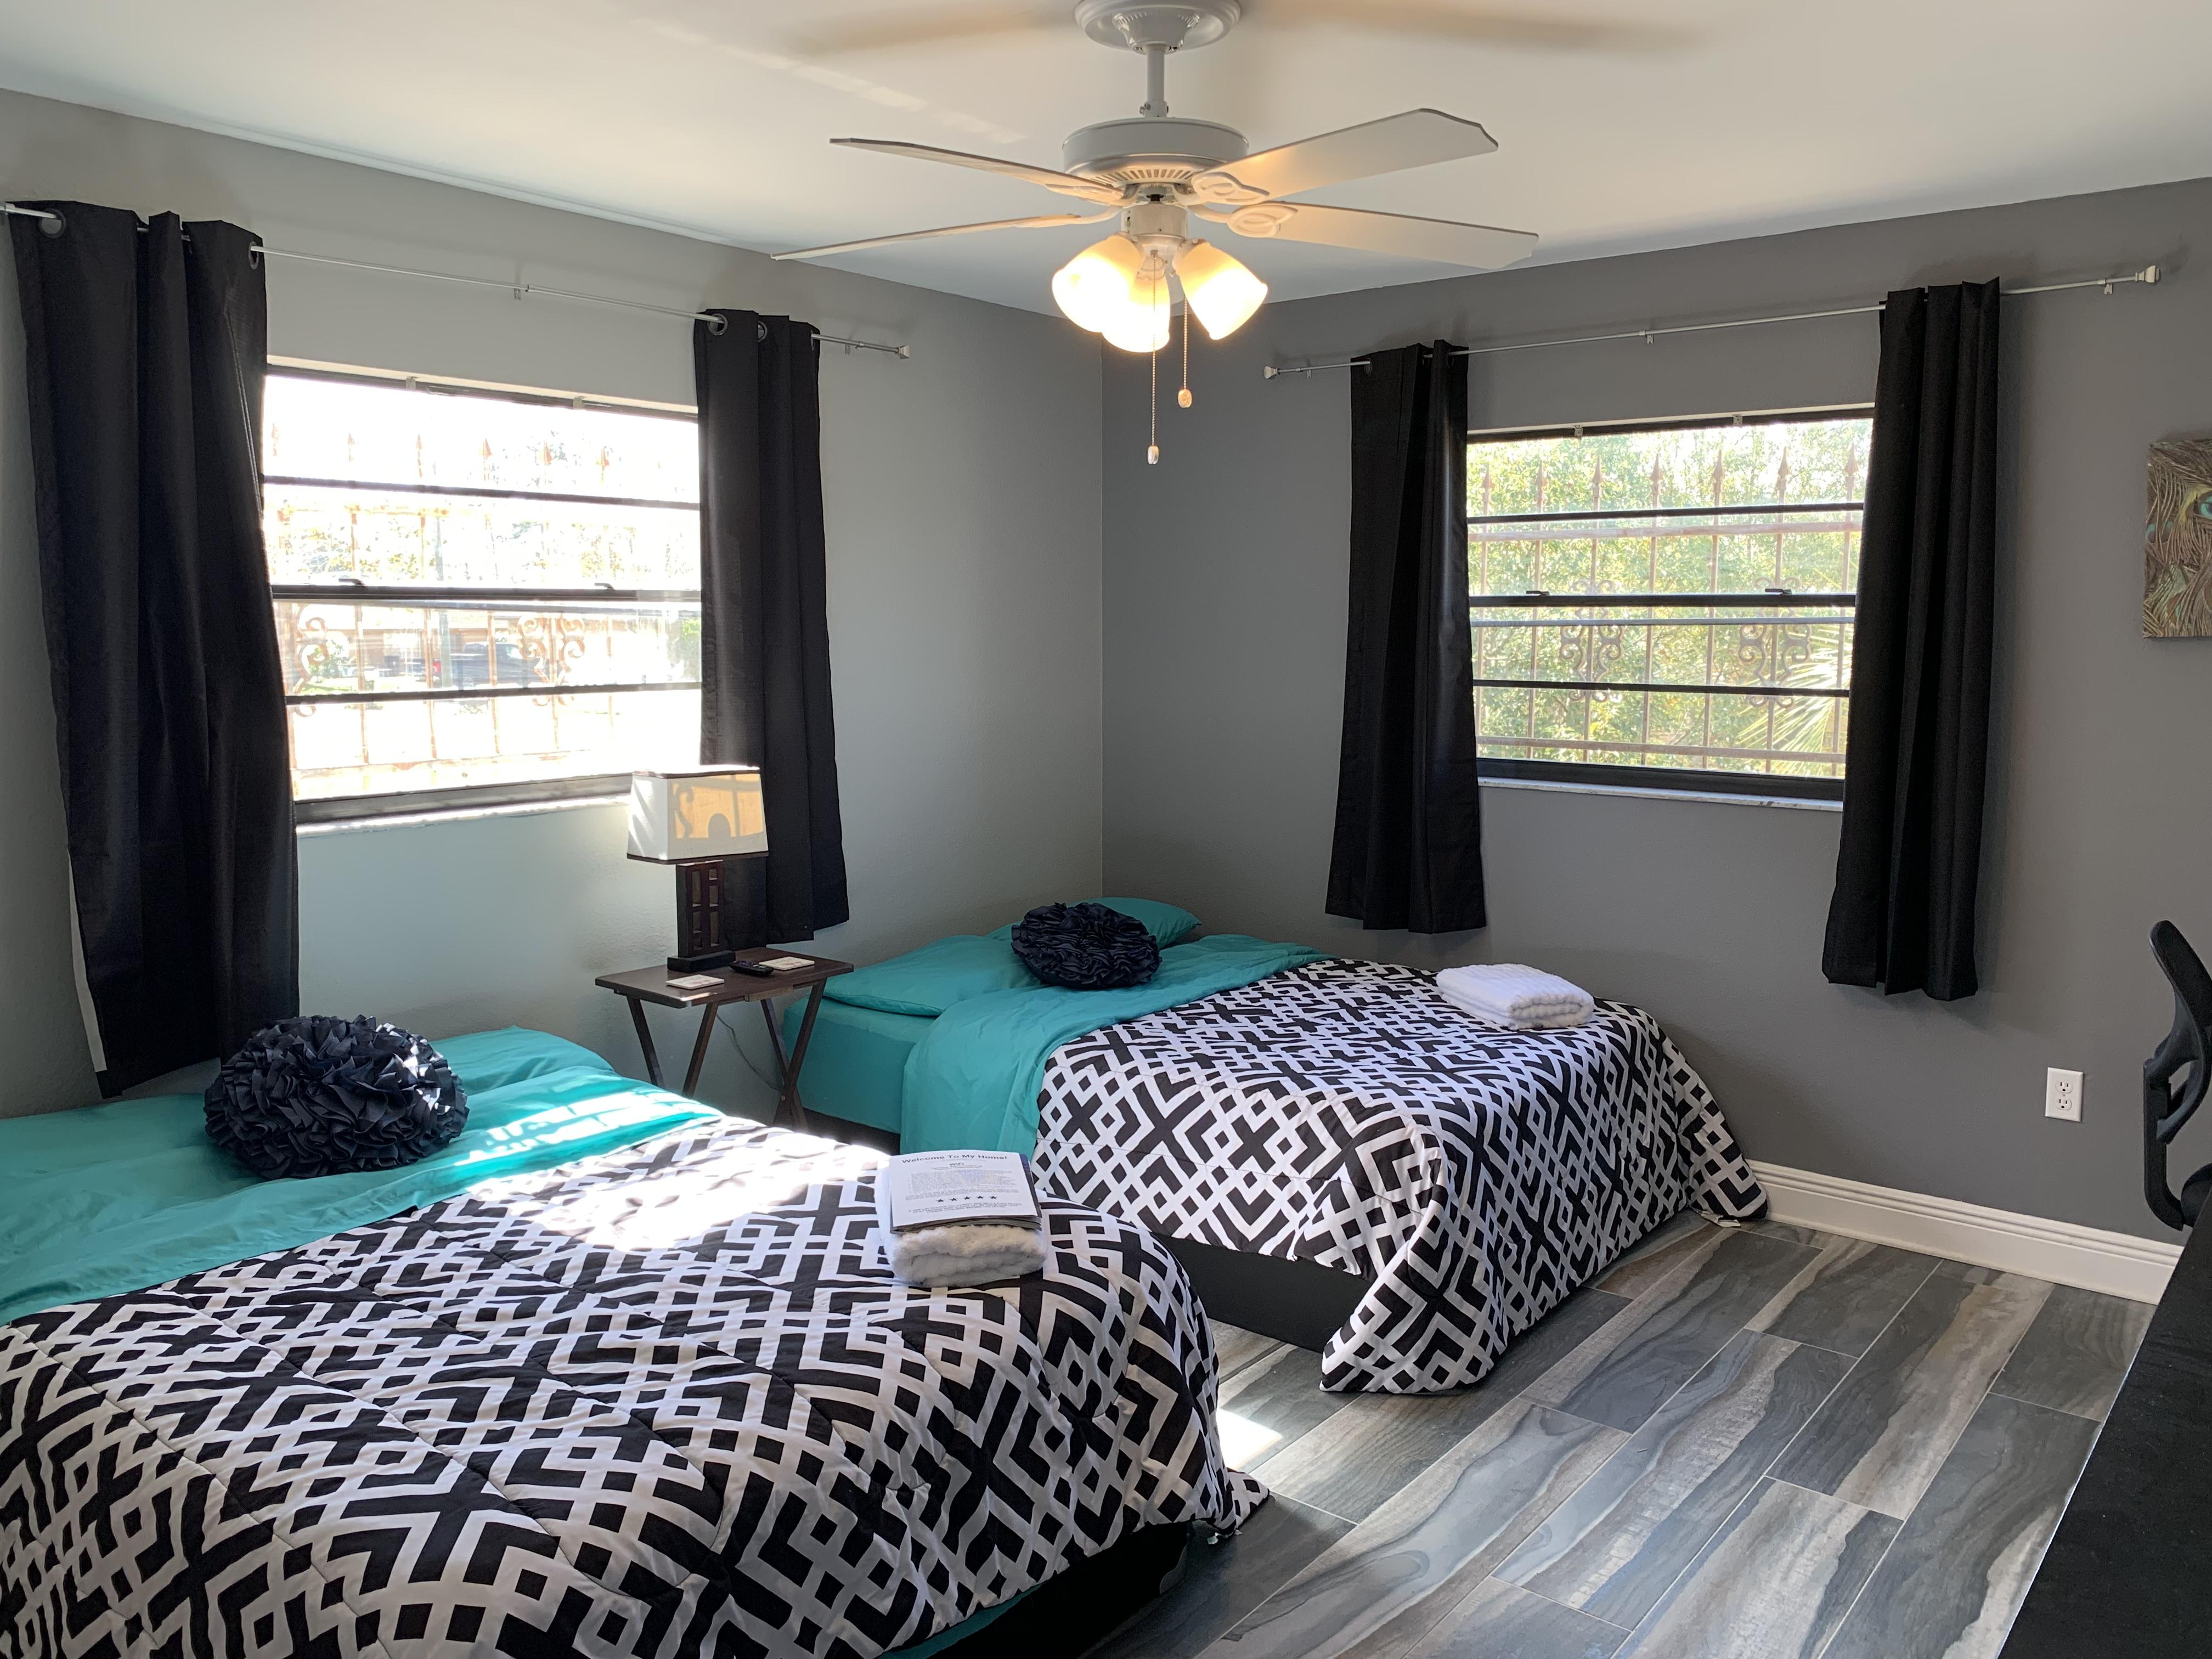 Apartment 3 Bedroom House photo 16823524